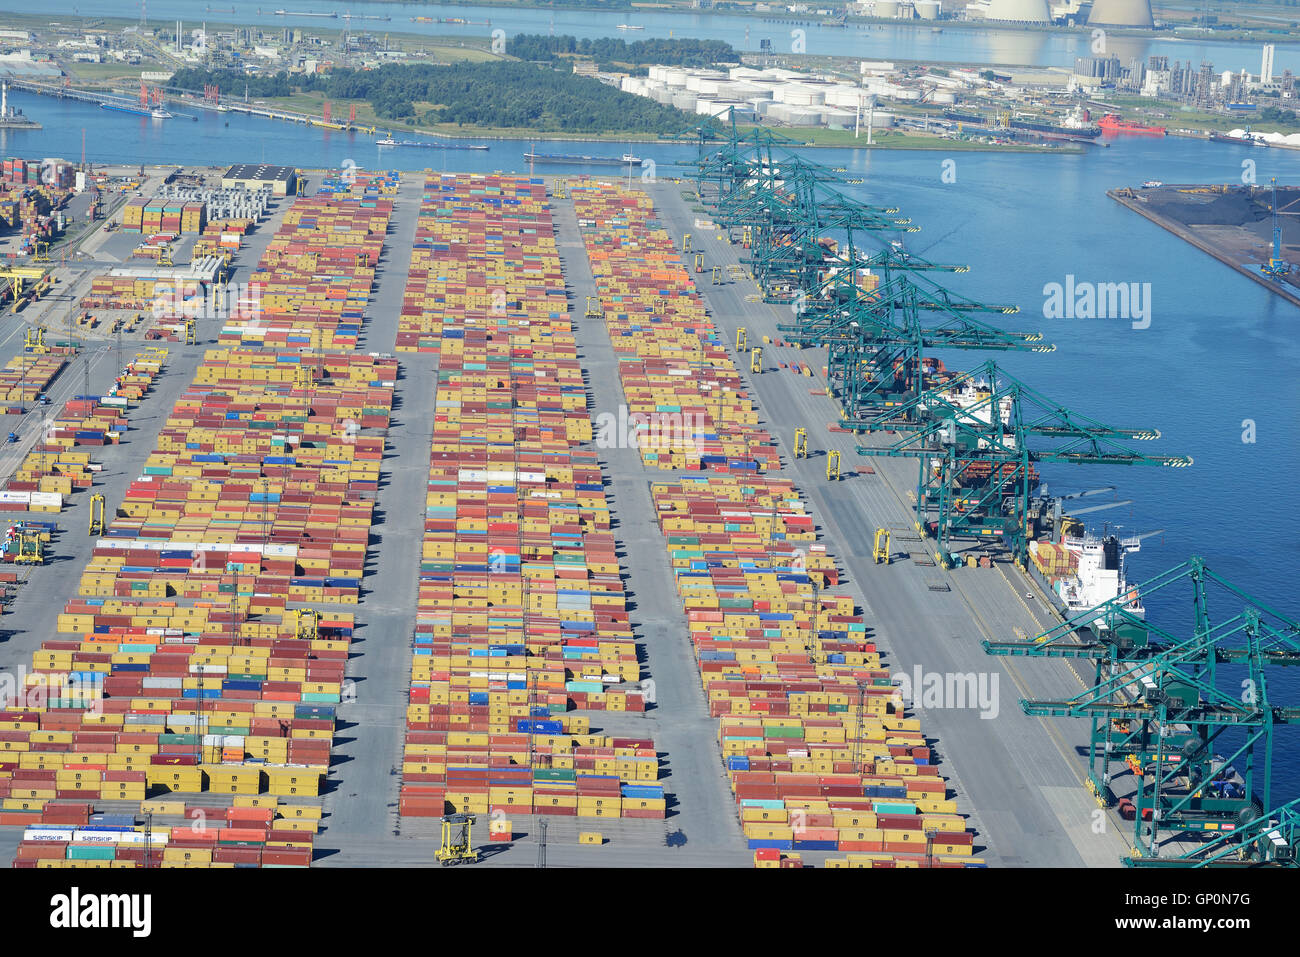 CONTAINERS & CRANES ON DELWAIDE DOCK (aerial view). Delwaidedok, Antwerp Harbor, Belgium. Stock Photo